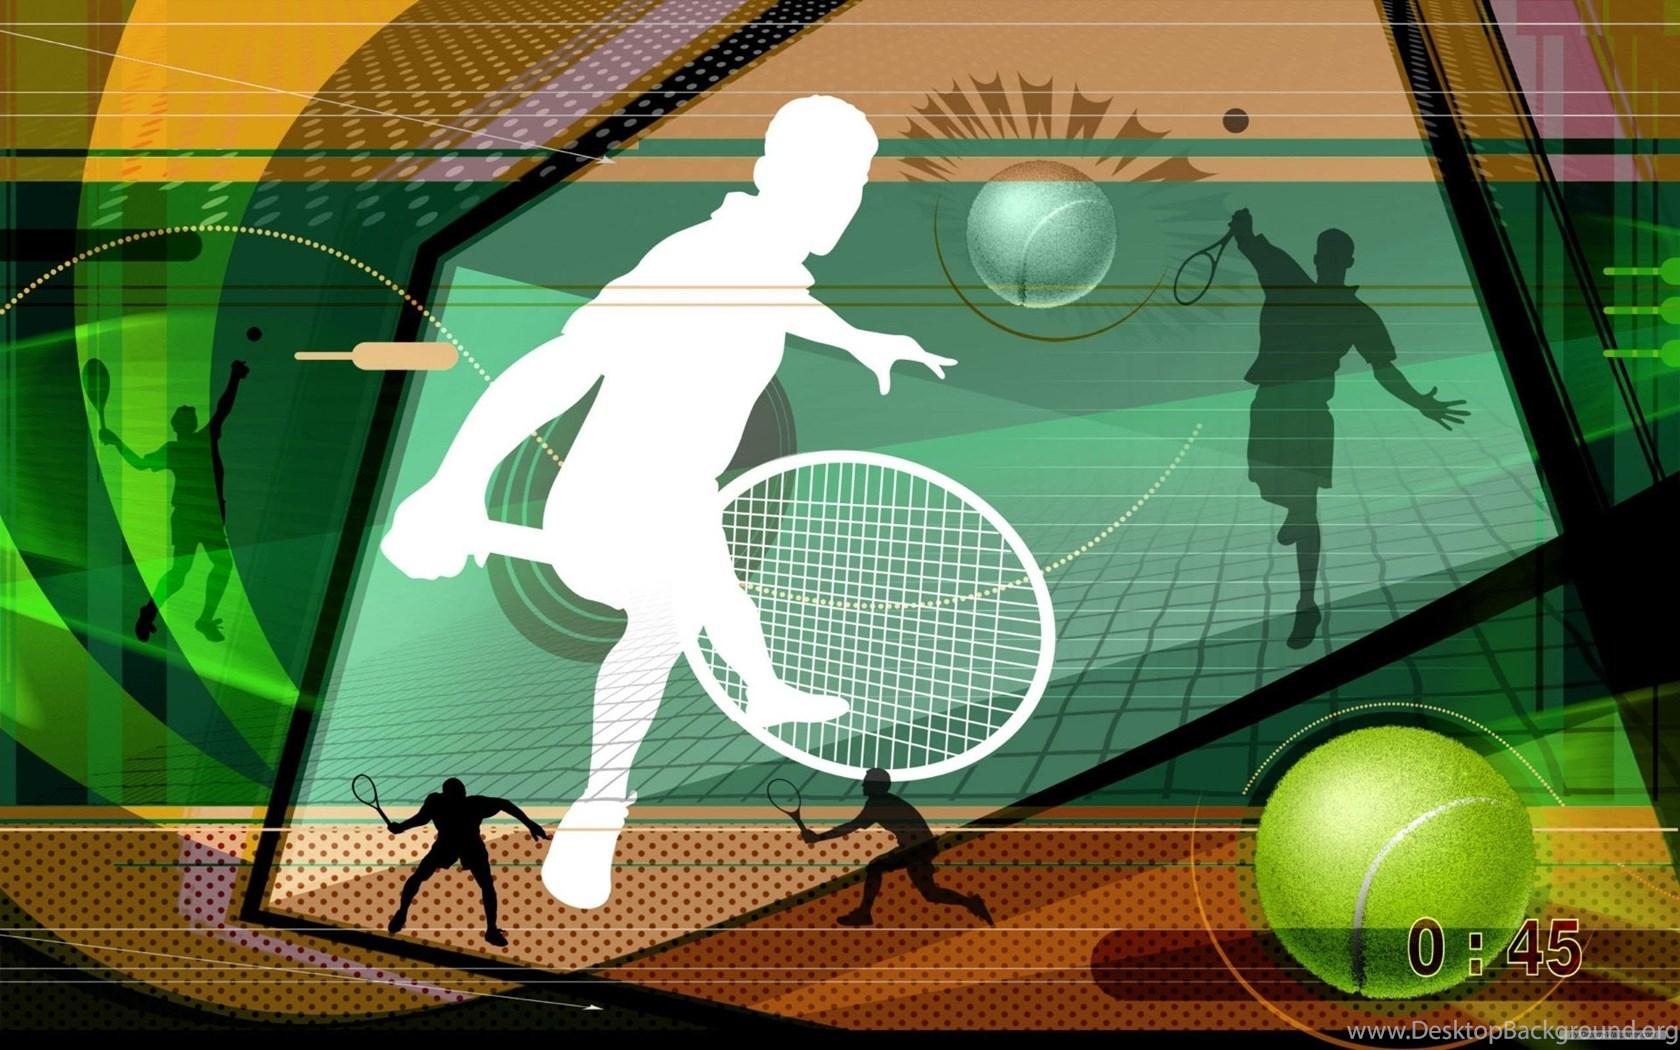 Sports Design Wallpaper Hd